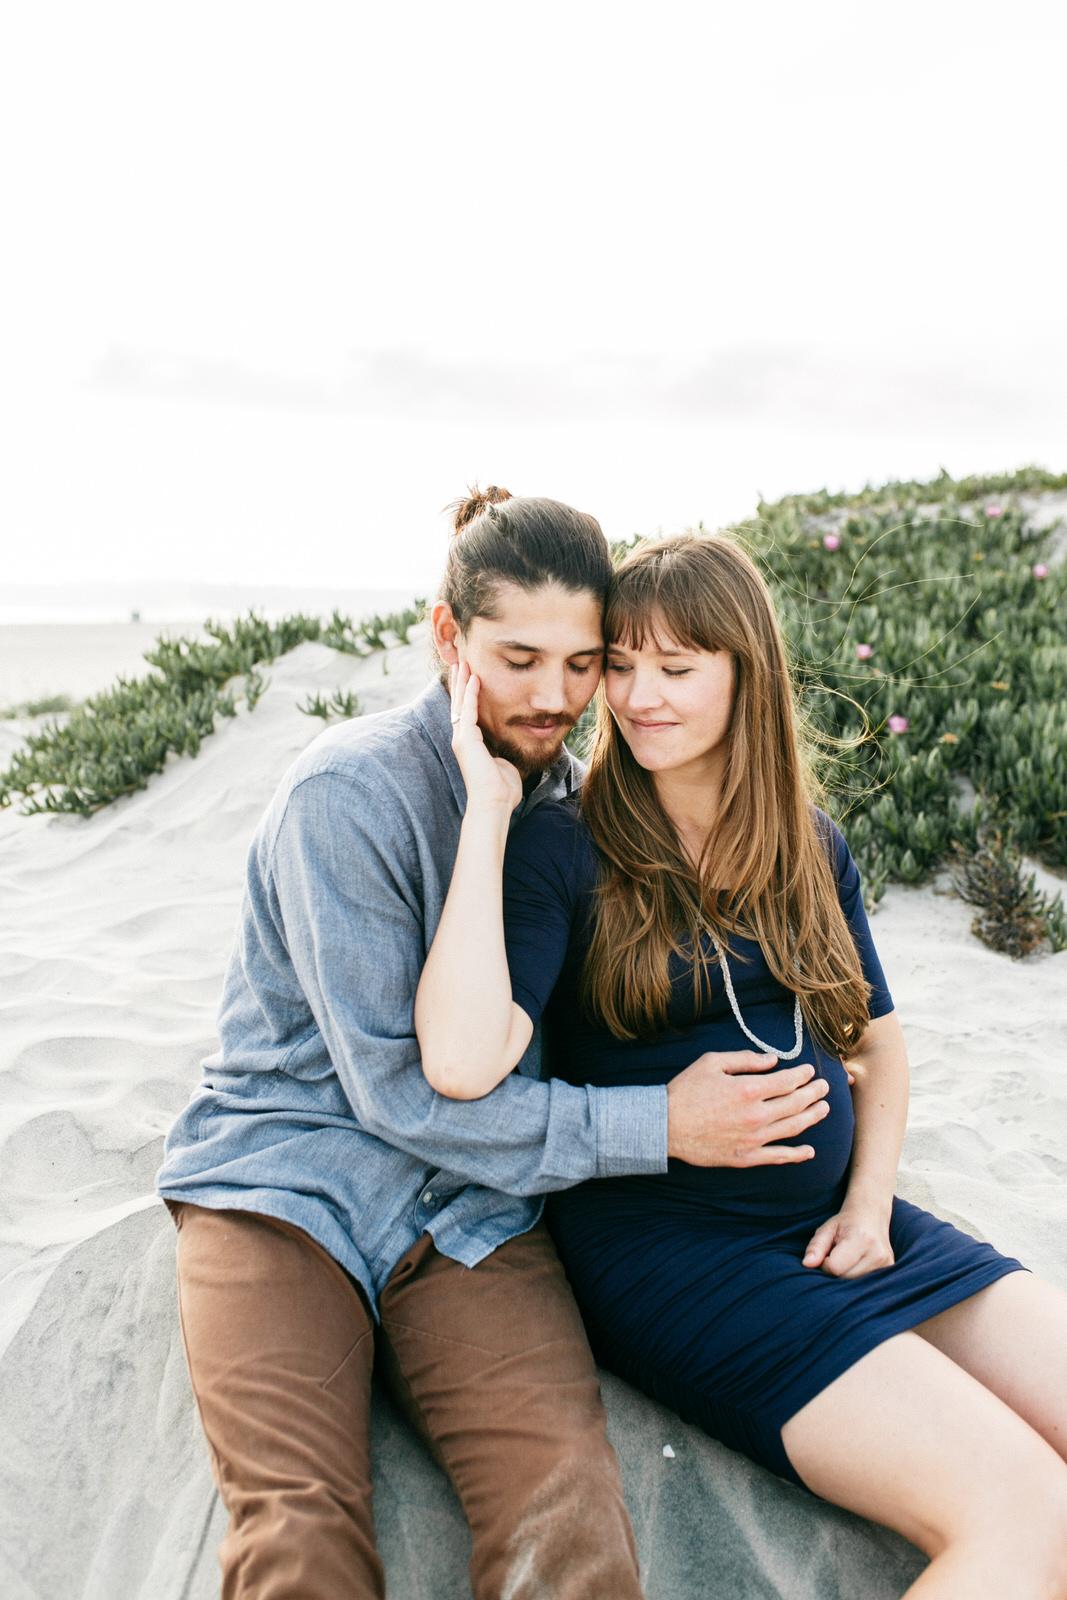 SamErica Studios - San Diego Maternity Photographer - Babymoon in Coronado-16.jpg